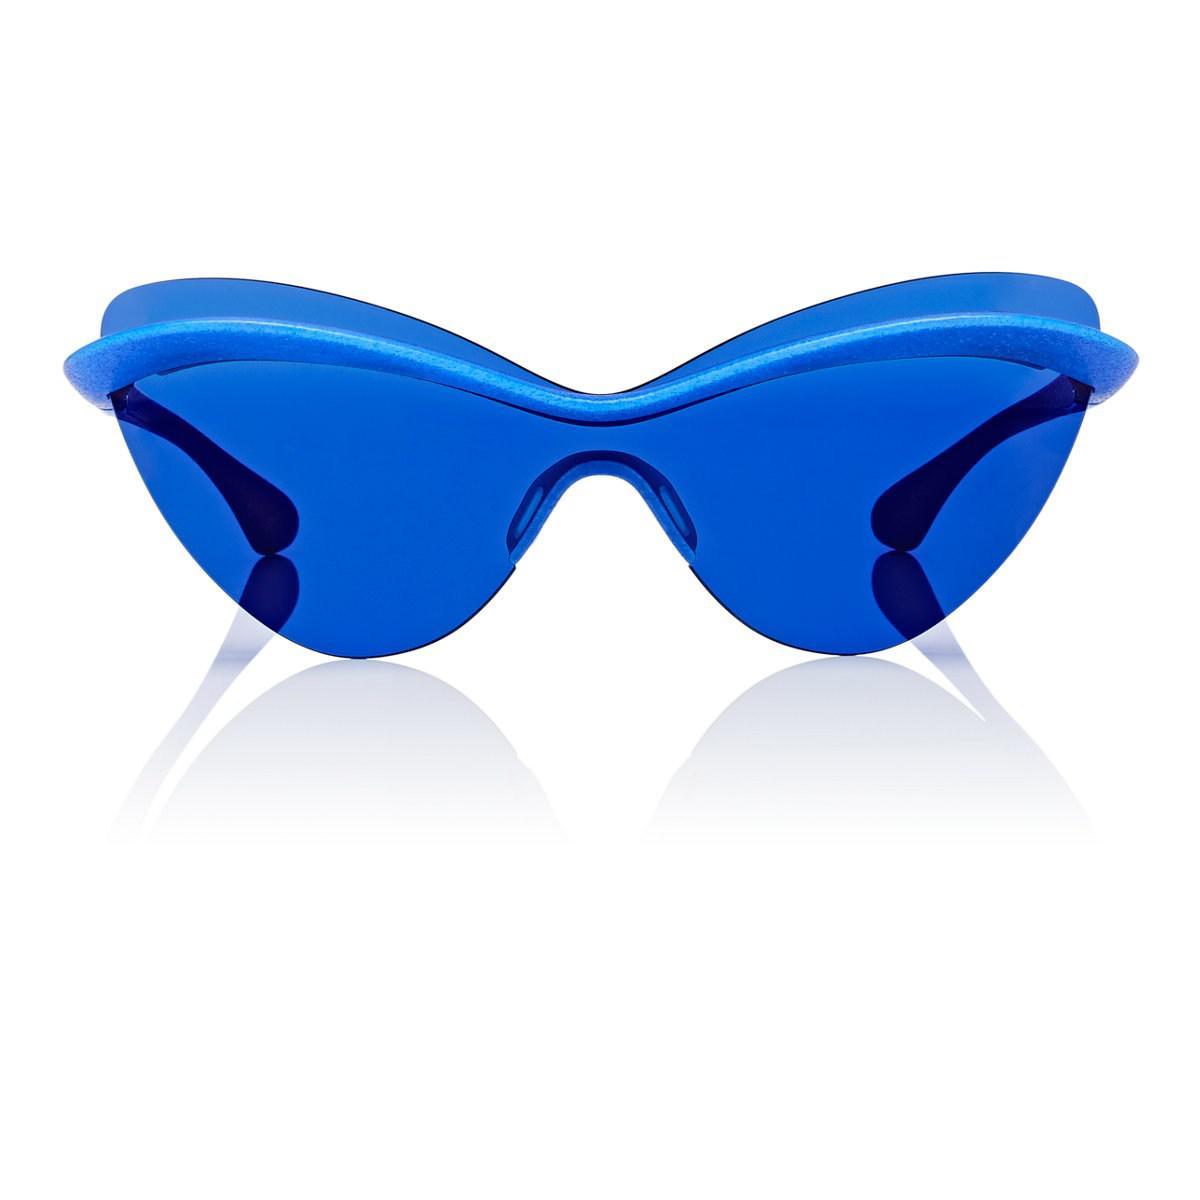 Gafas De Sol Para Mujer Mmecho001 Casa Martin Margiela WVAmPkKp9G